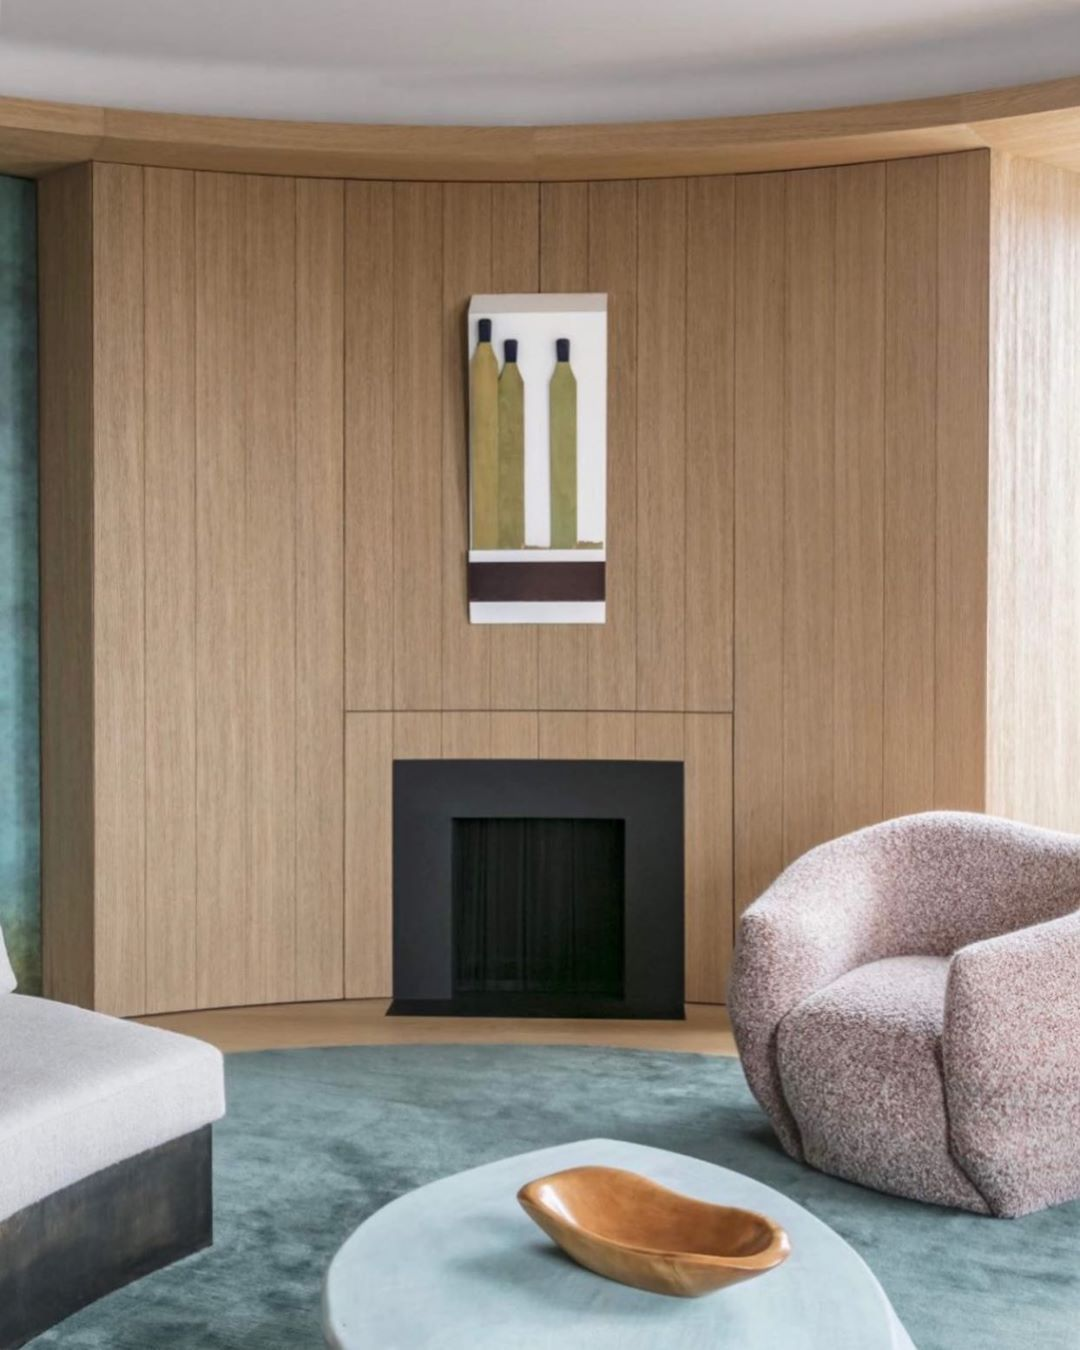 Top Interior Designers Of 2020 Pierre Yovanovitch Fireplace Design Wood Interior Design